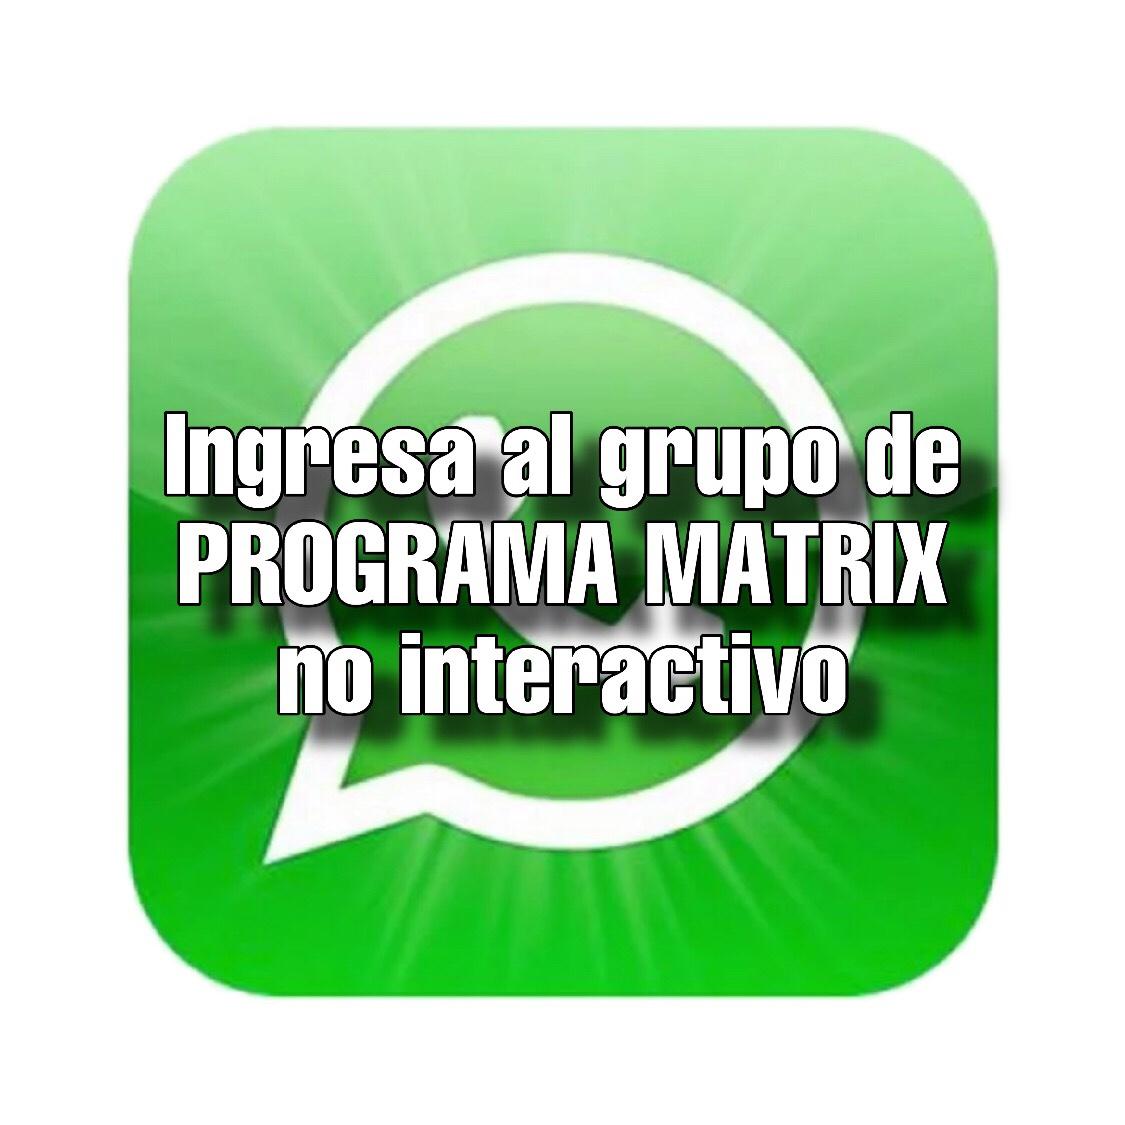 Ingreso al grupo de PROGRAMA MATRIX no interactivo